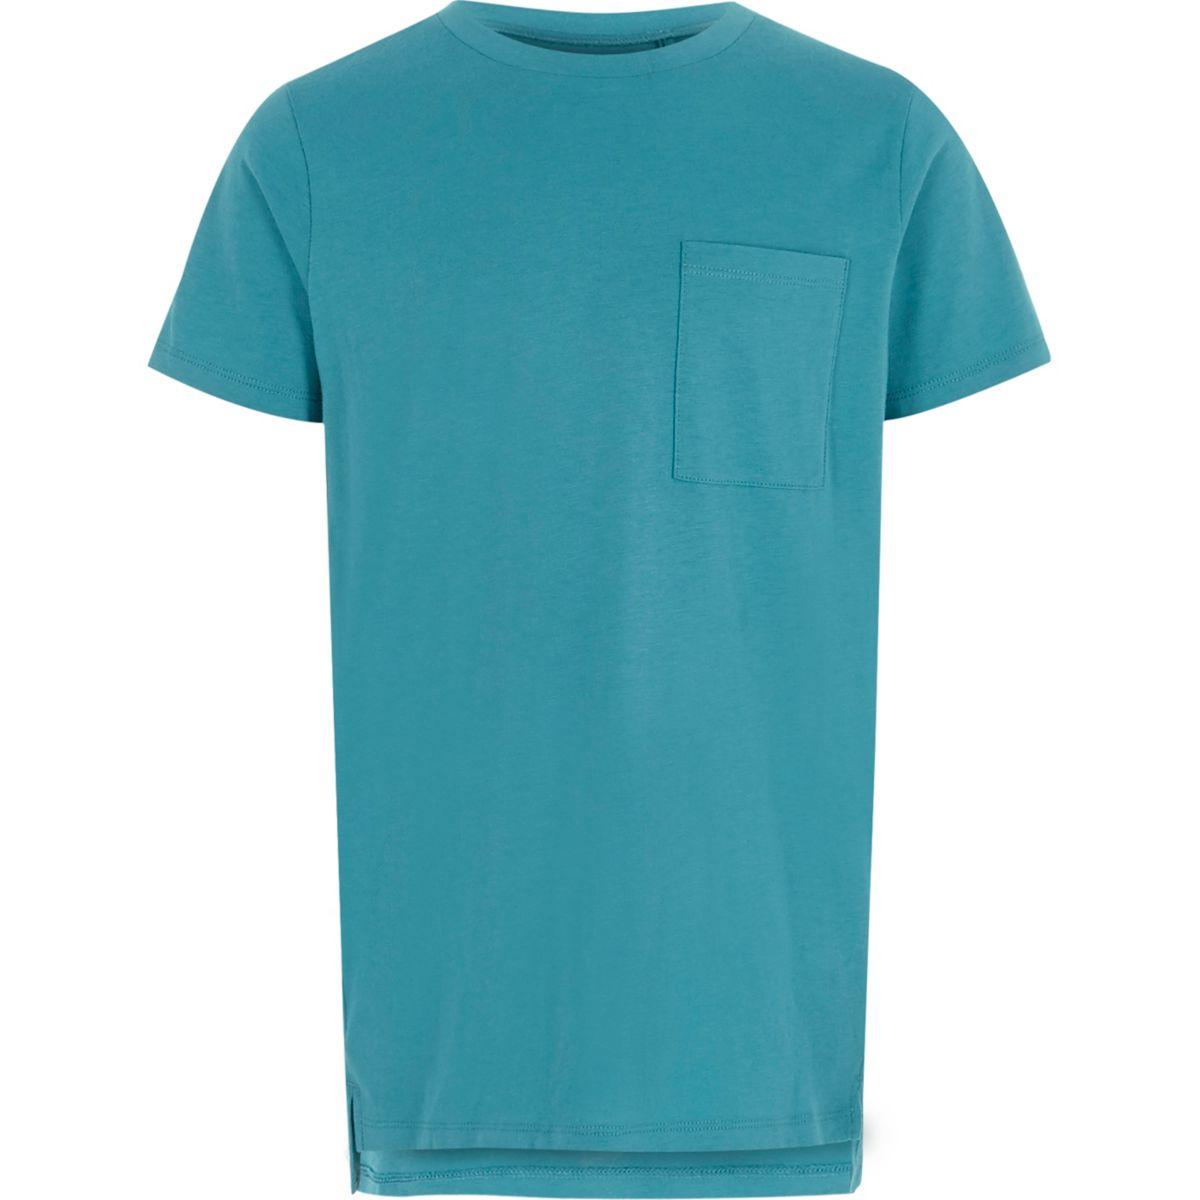 Boys turquoise pocket t shirt t shirts t shirts for Boys pocket t shirt